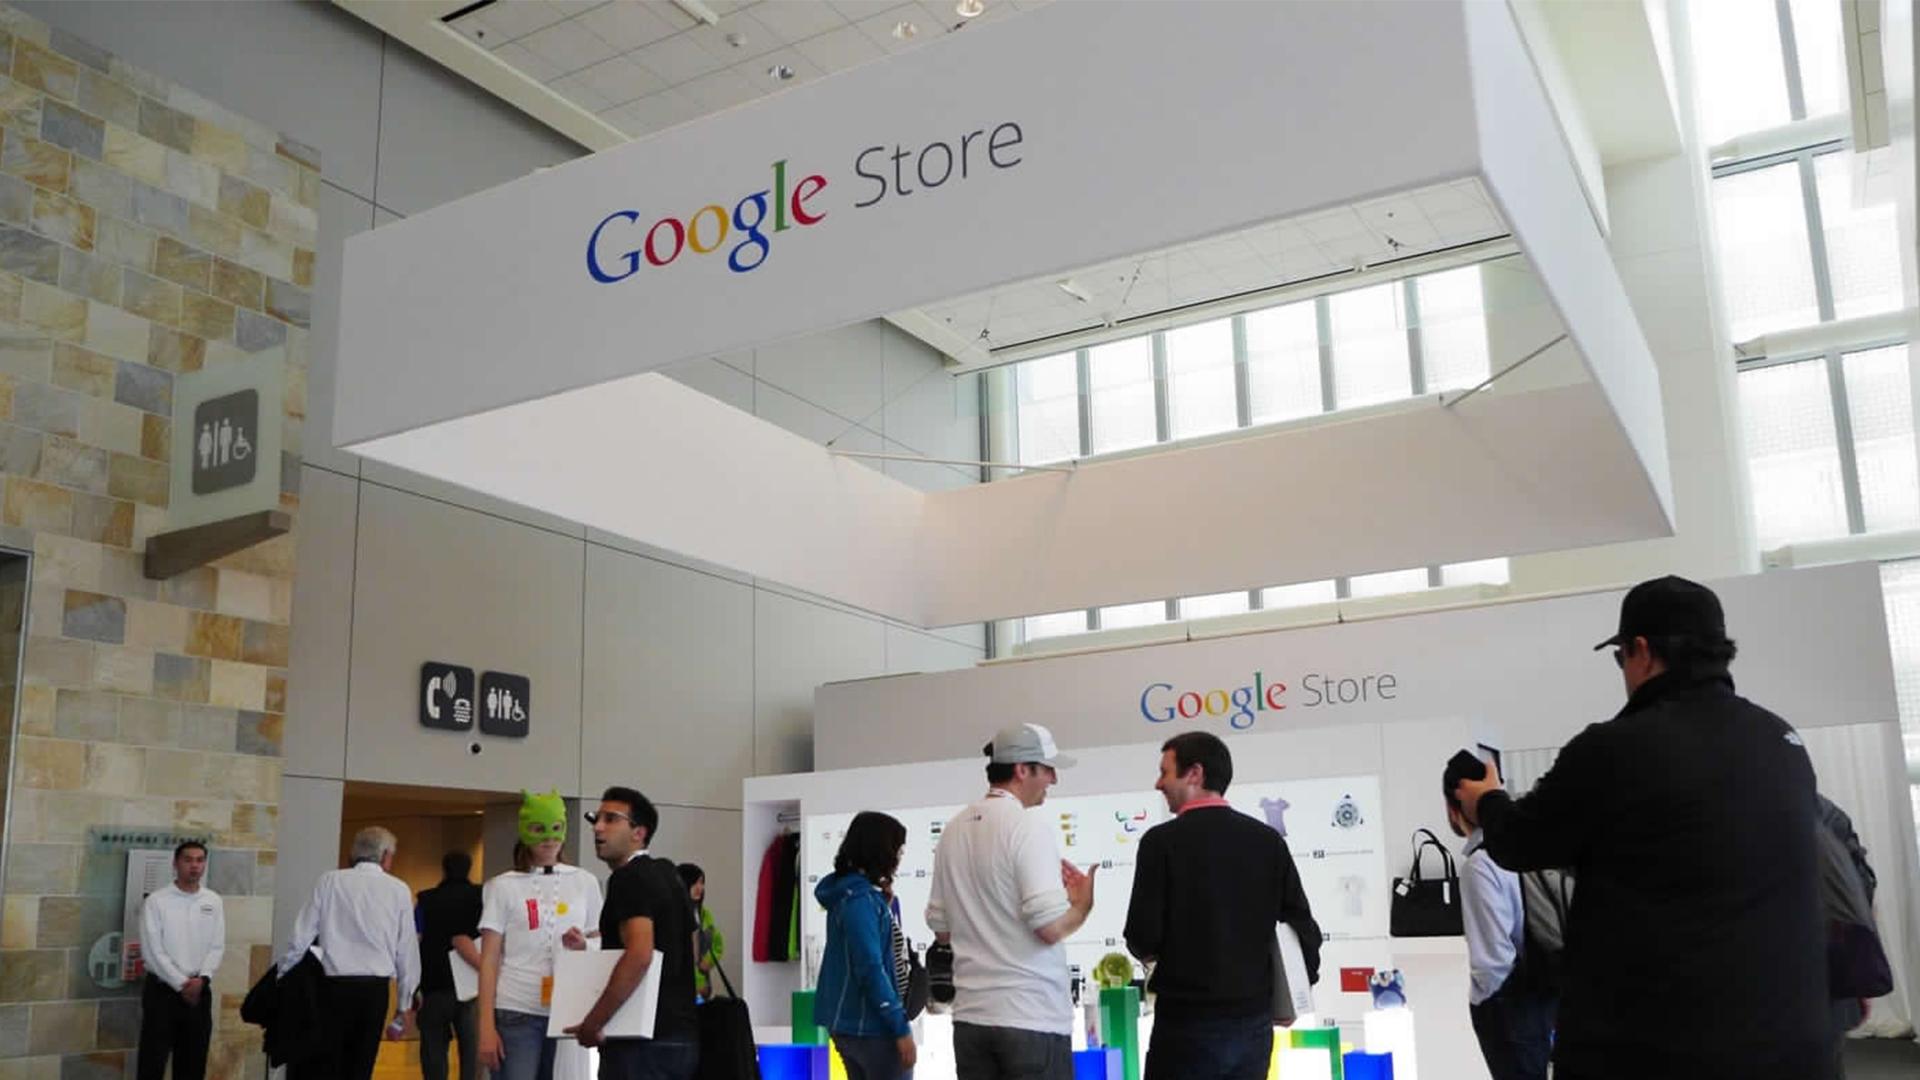 googlestore-thumb.png